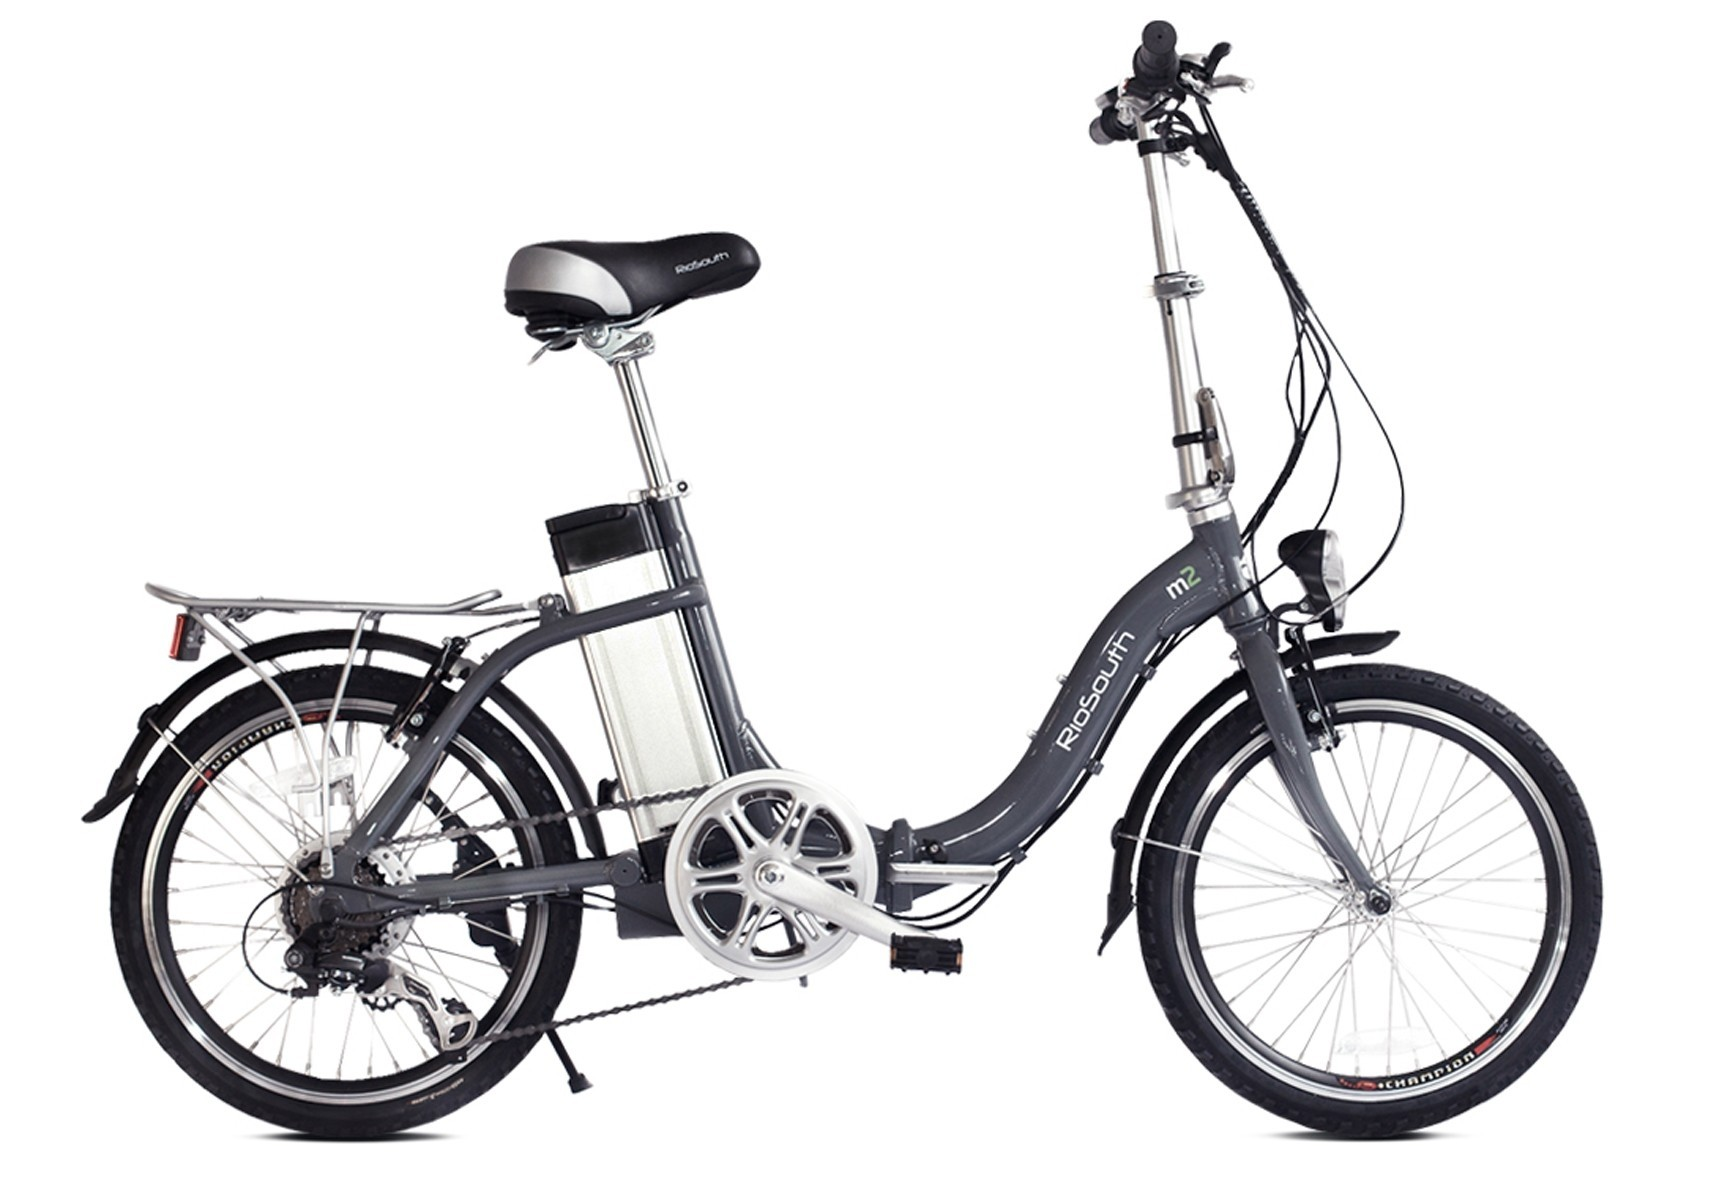 Bicicleta Elétrica Dobrável RioSouth M2